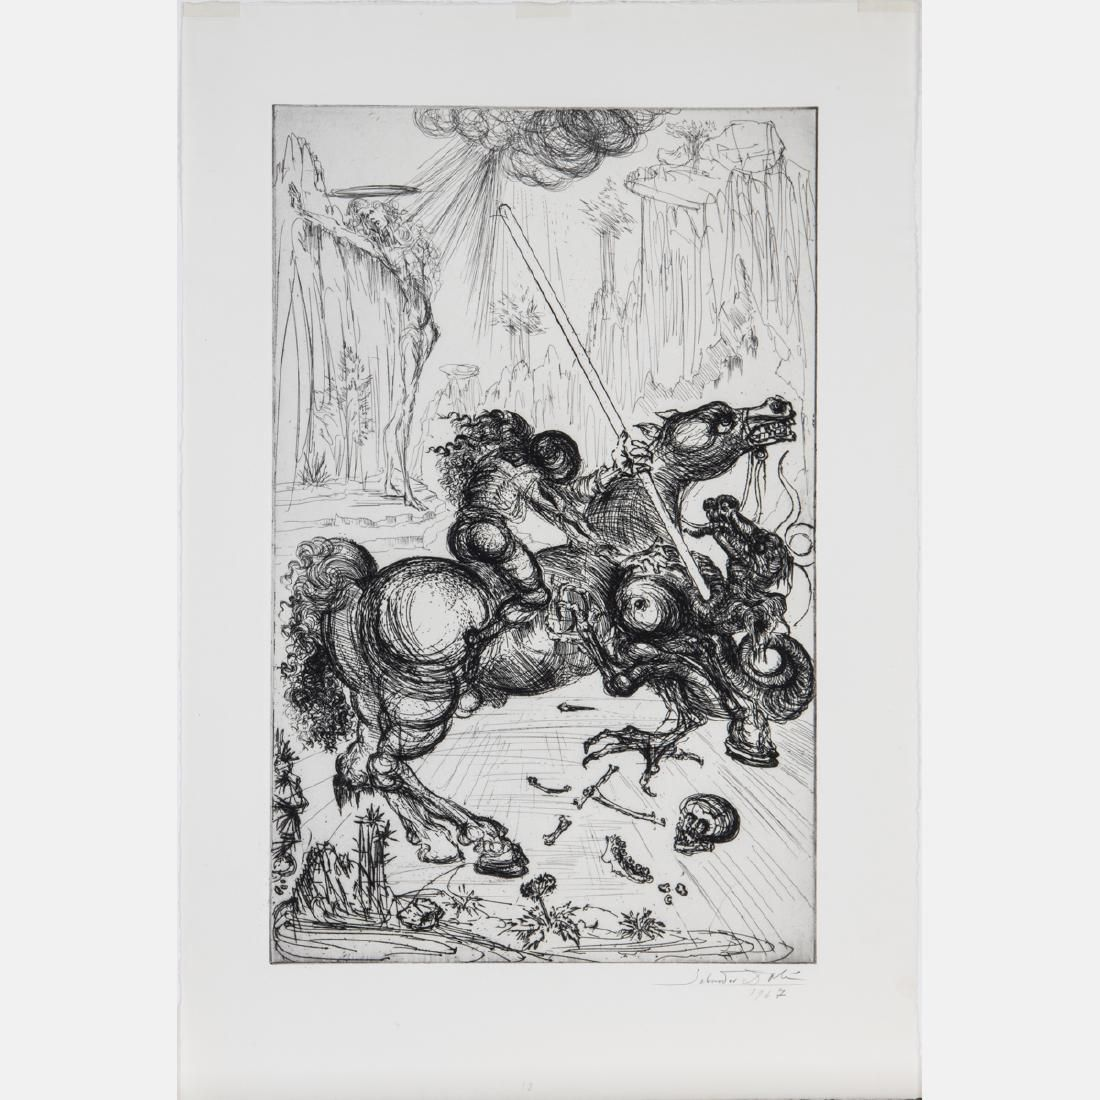 Salvador Dali (1904-1989) St. George and the Dragon,